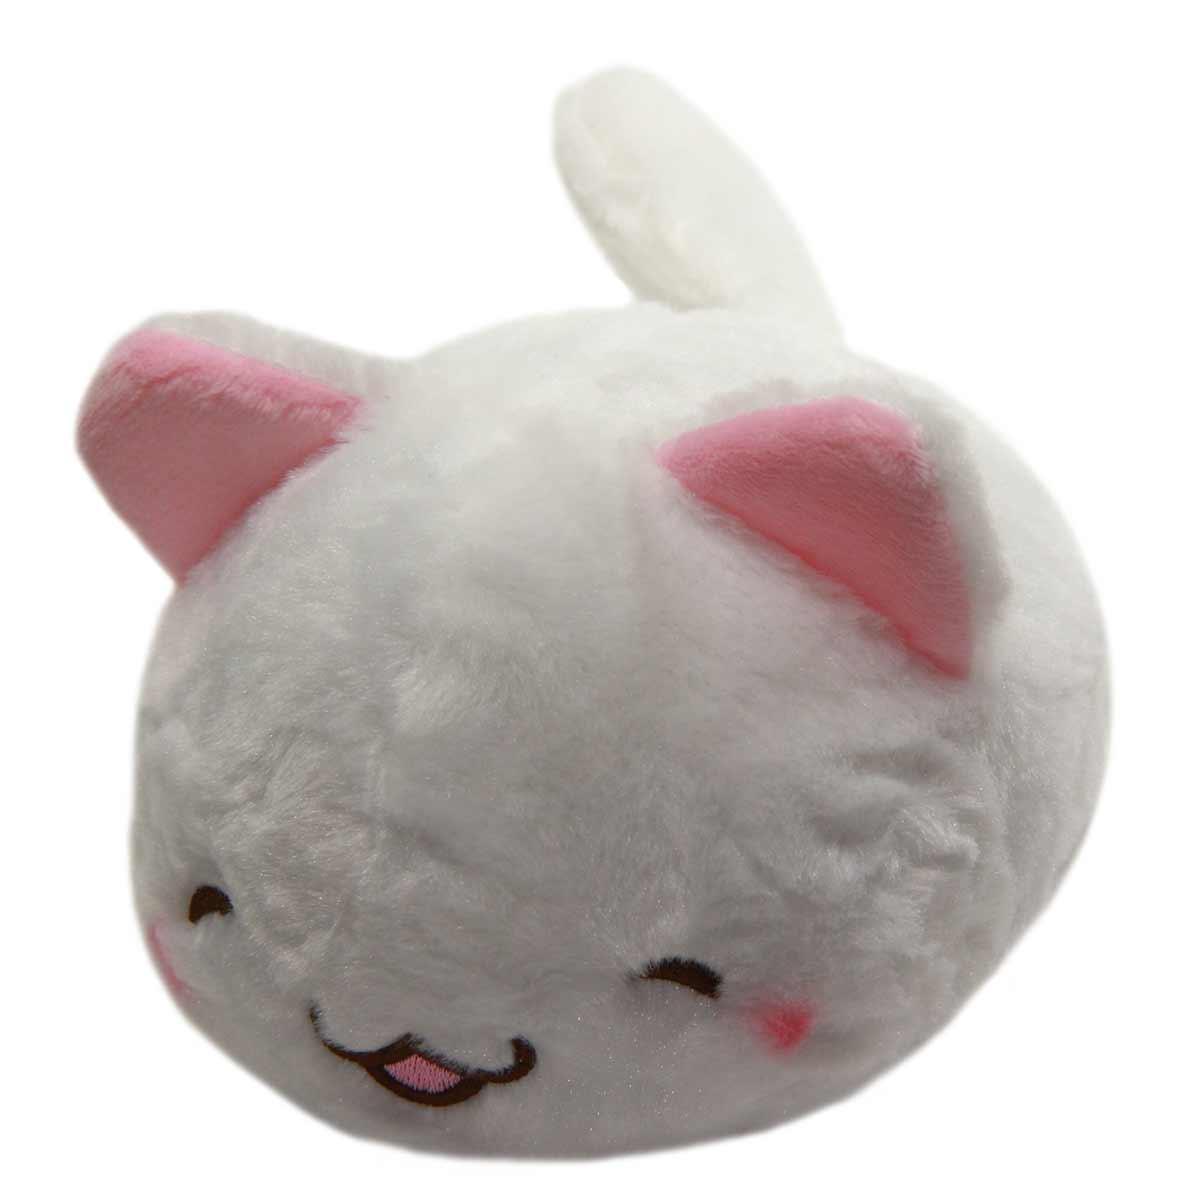 Kawaii Neko Plushie White Cat Plush Doll Super Soft Stuffed Animal Standard Size 6